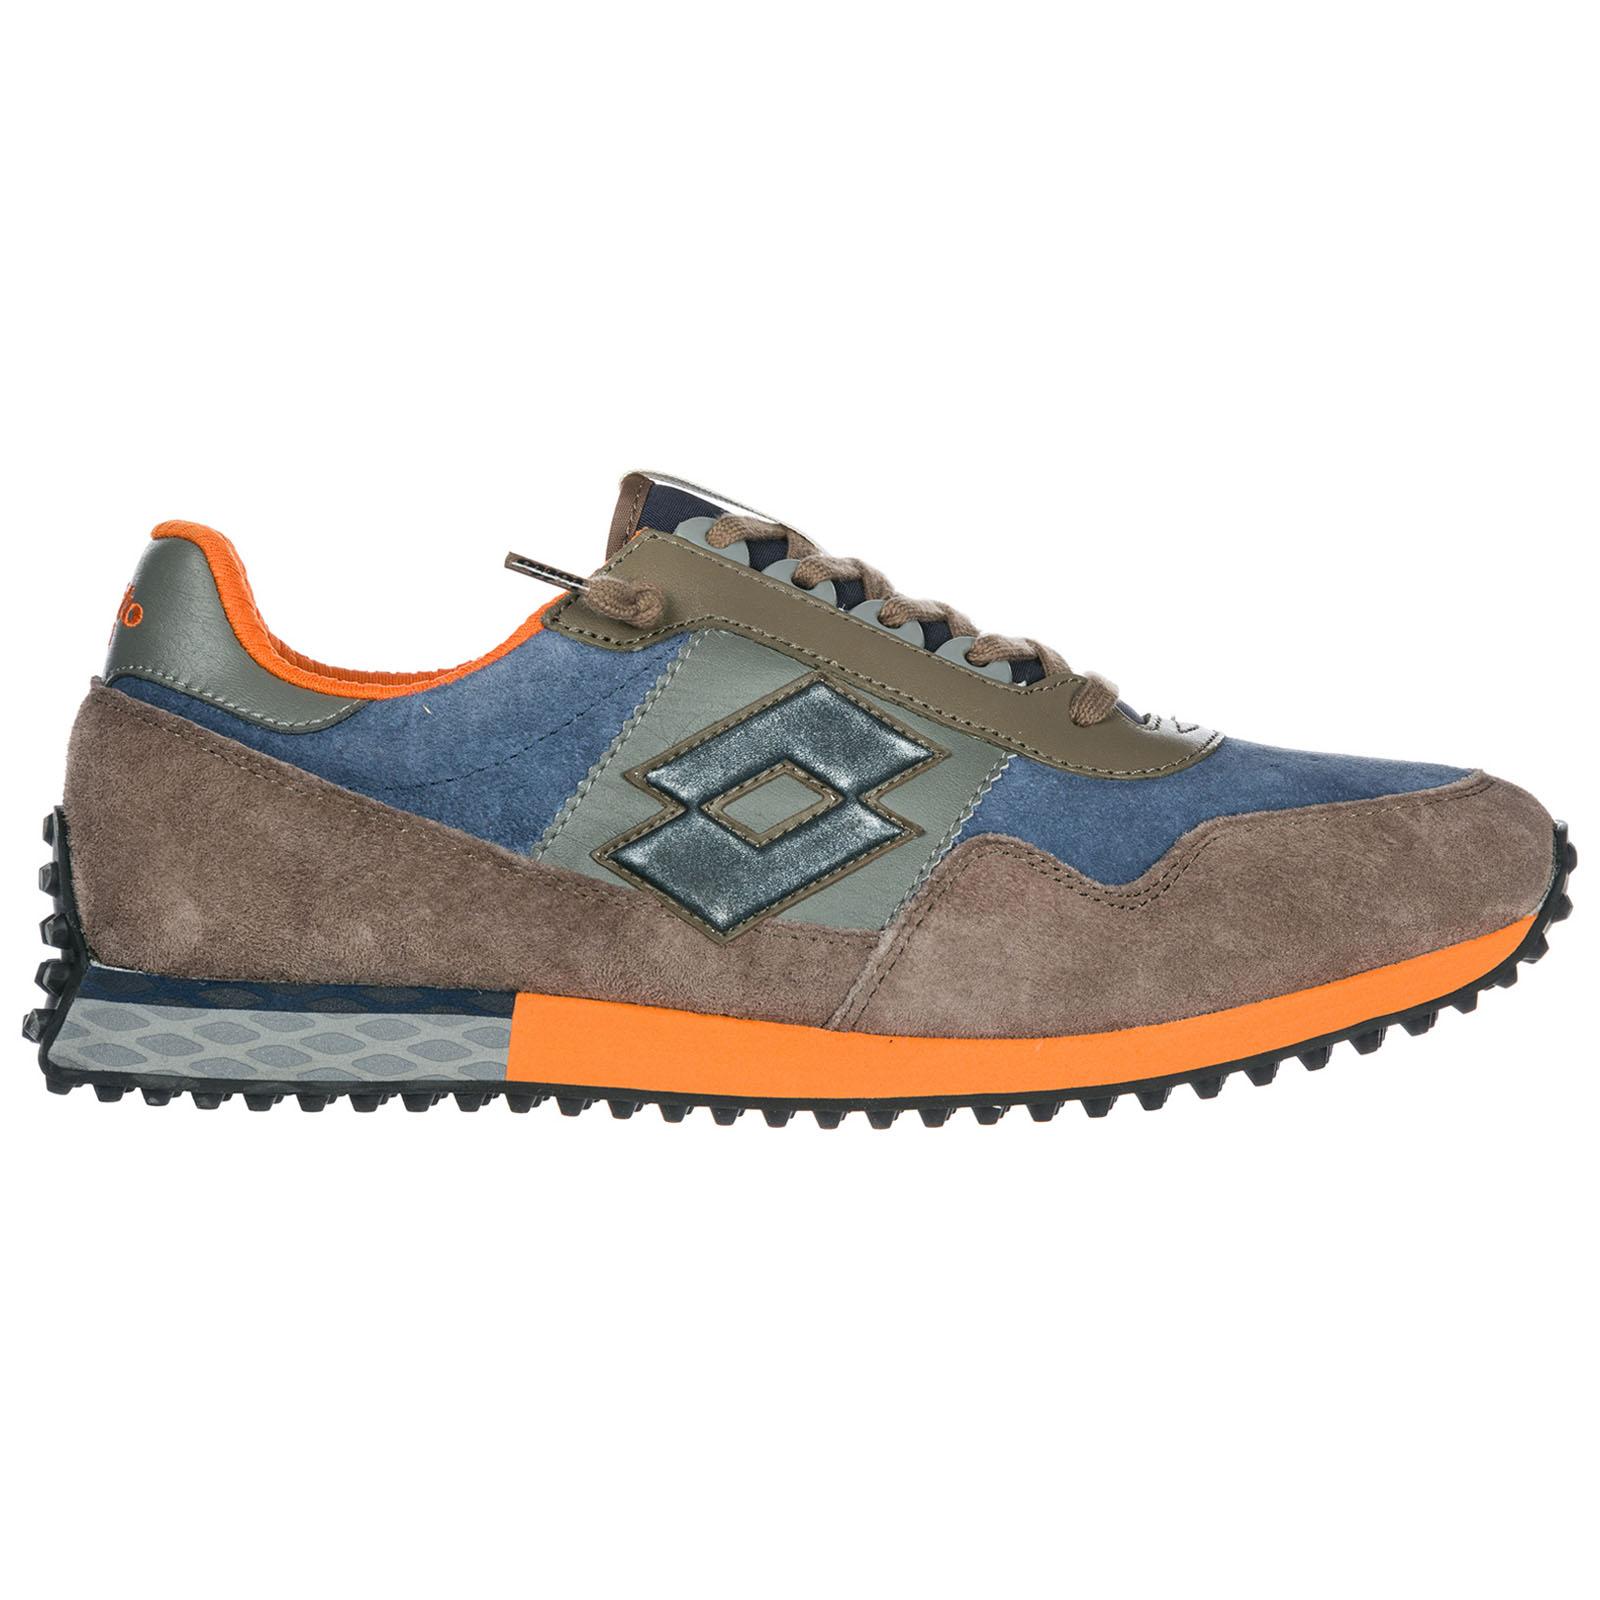 Scarpe sneakers uomo camoscio tokyo targa